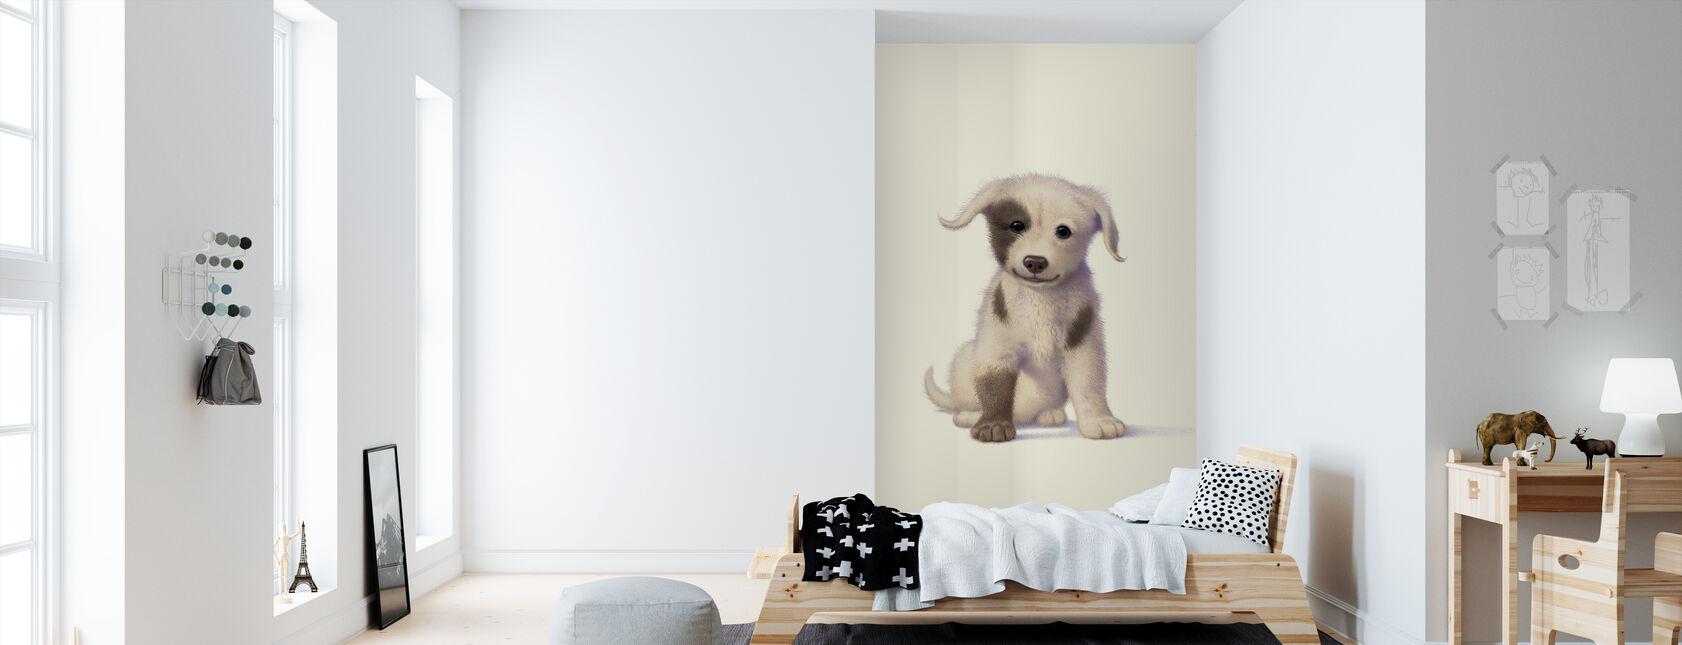 Puppy - Behang - Kinderkamer